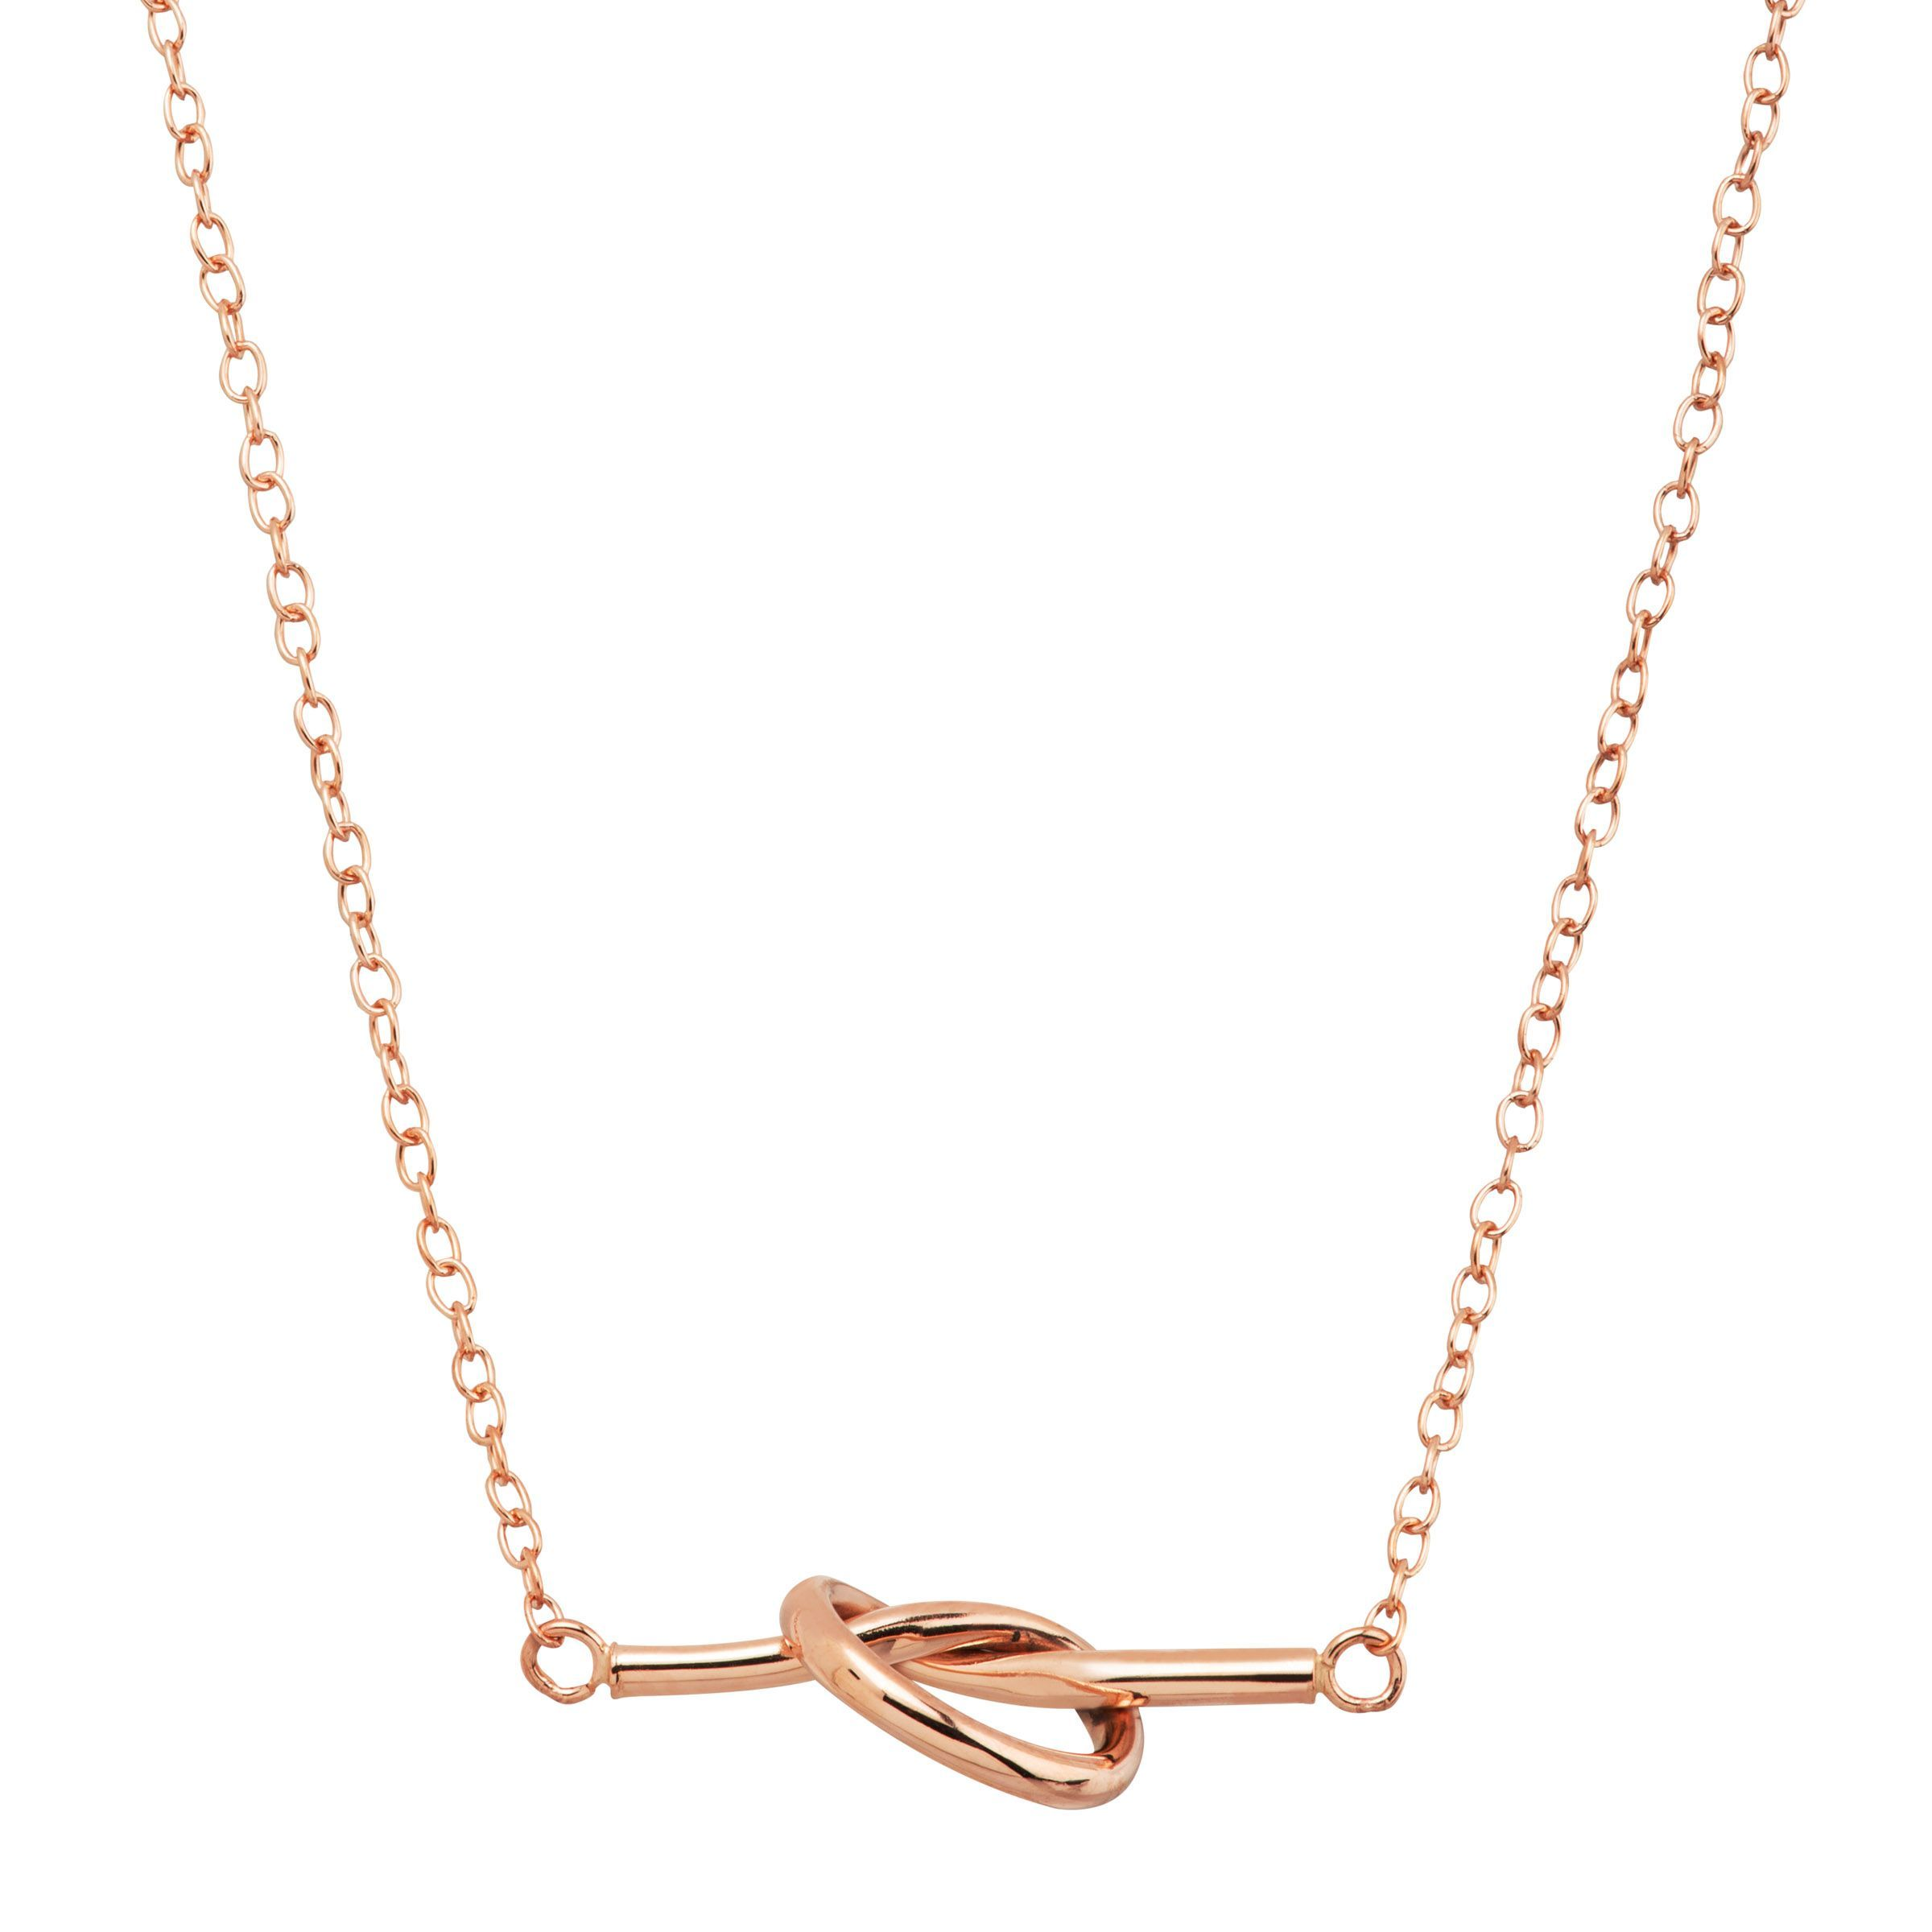 0f45c9f87959c9 Eternity Gold Love Knot Bar Necklace in 14K Rose Gold 98087885467 | eBay